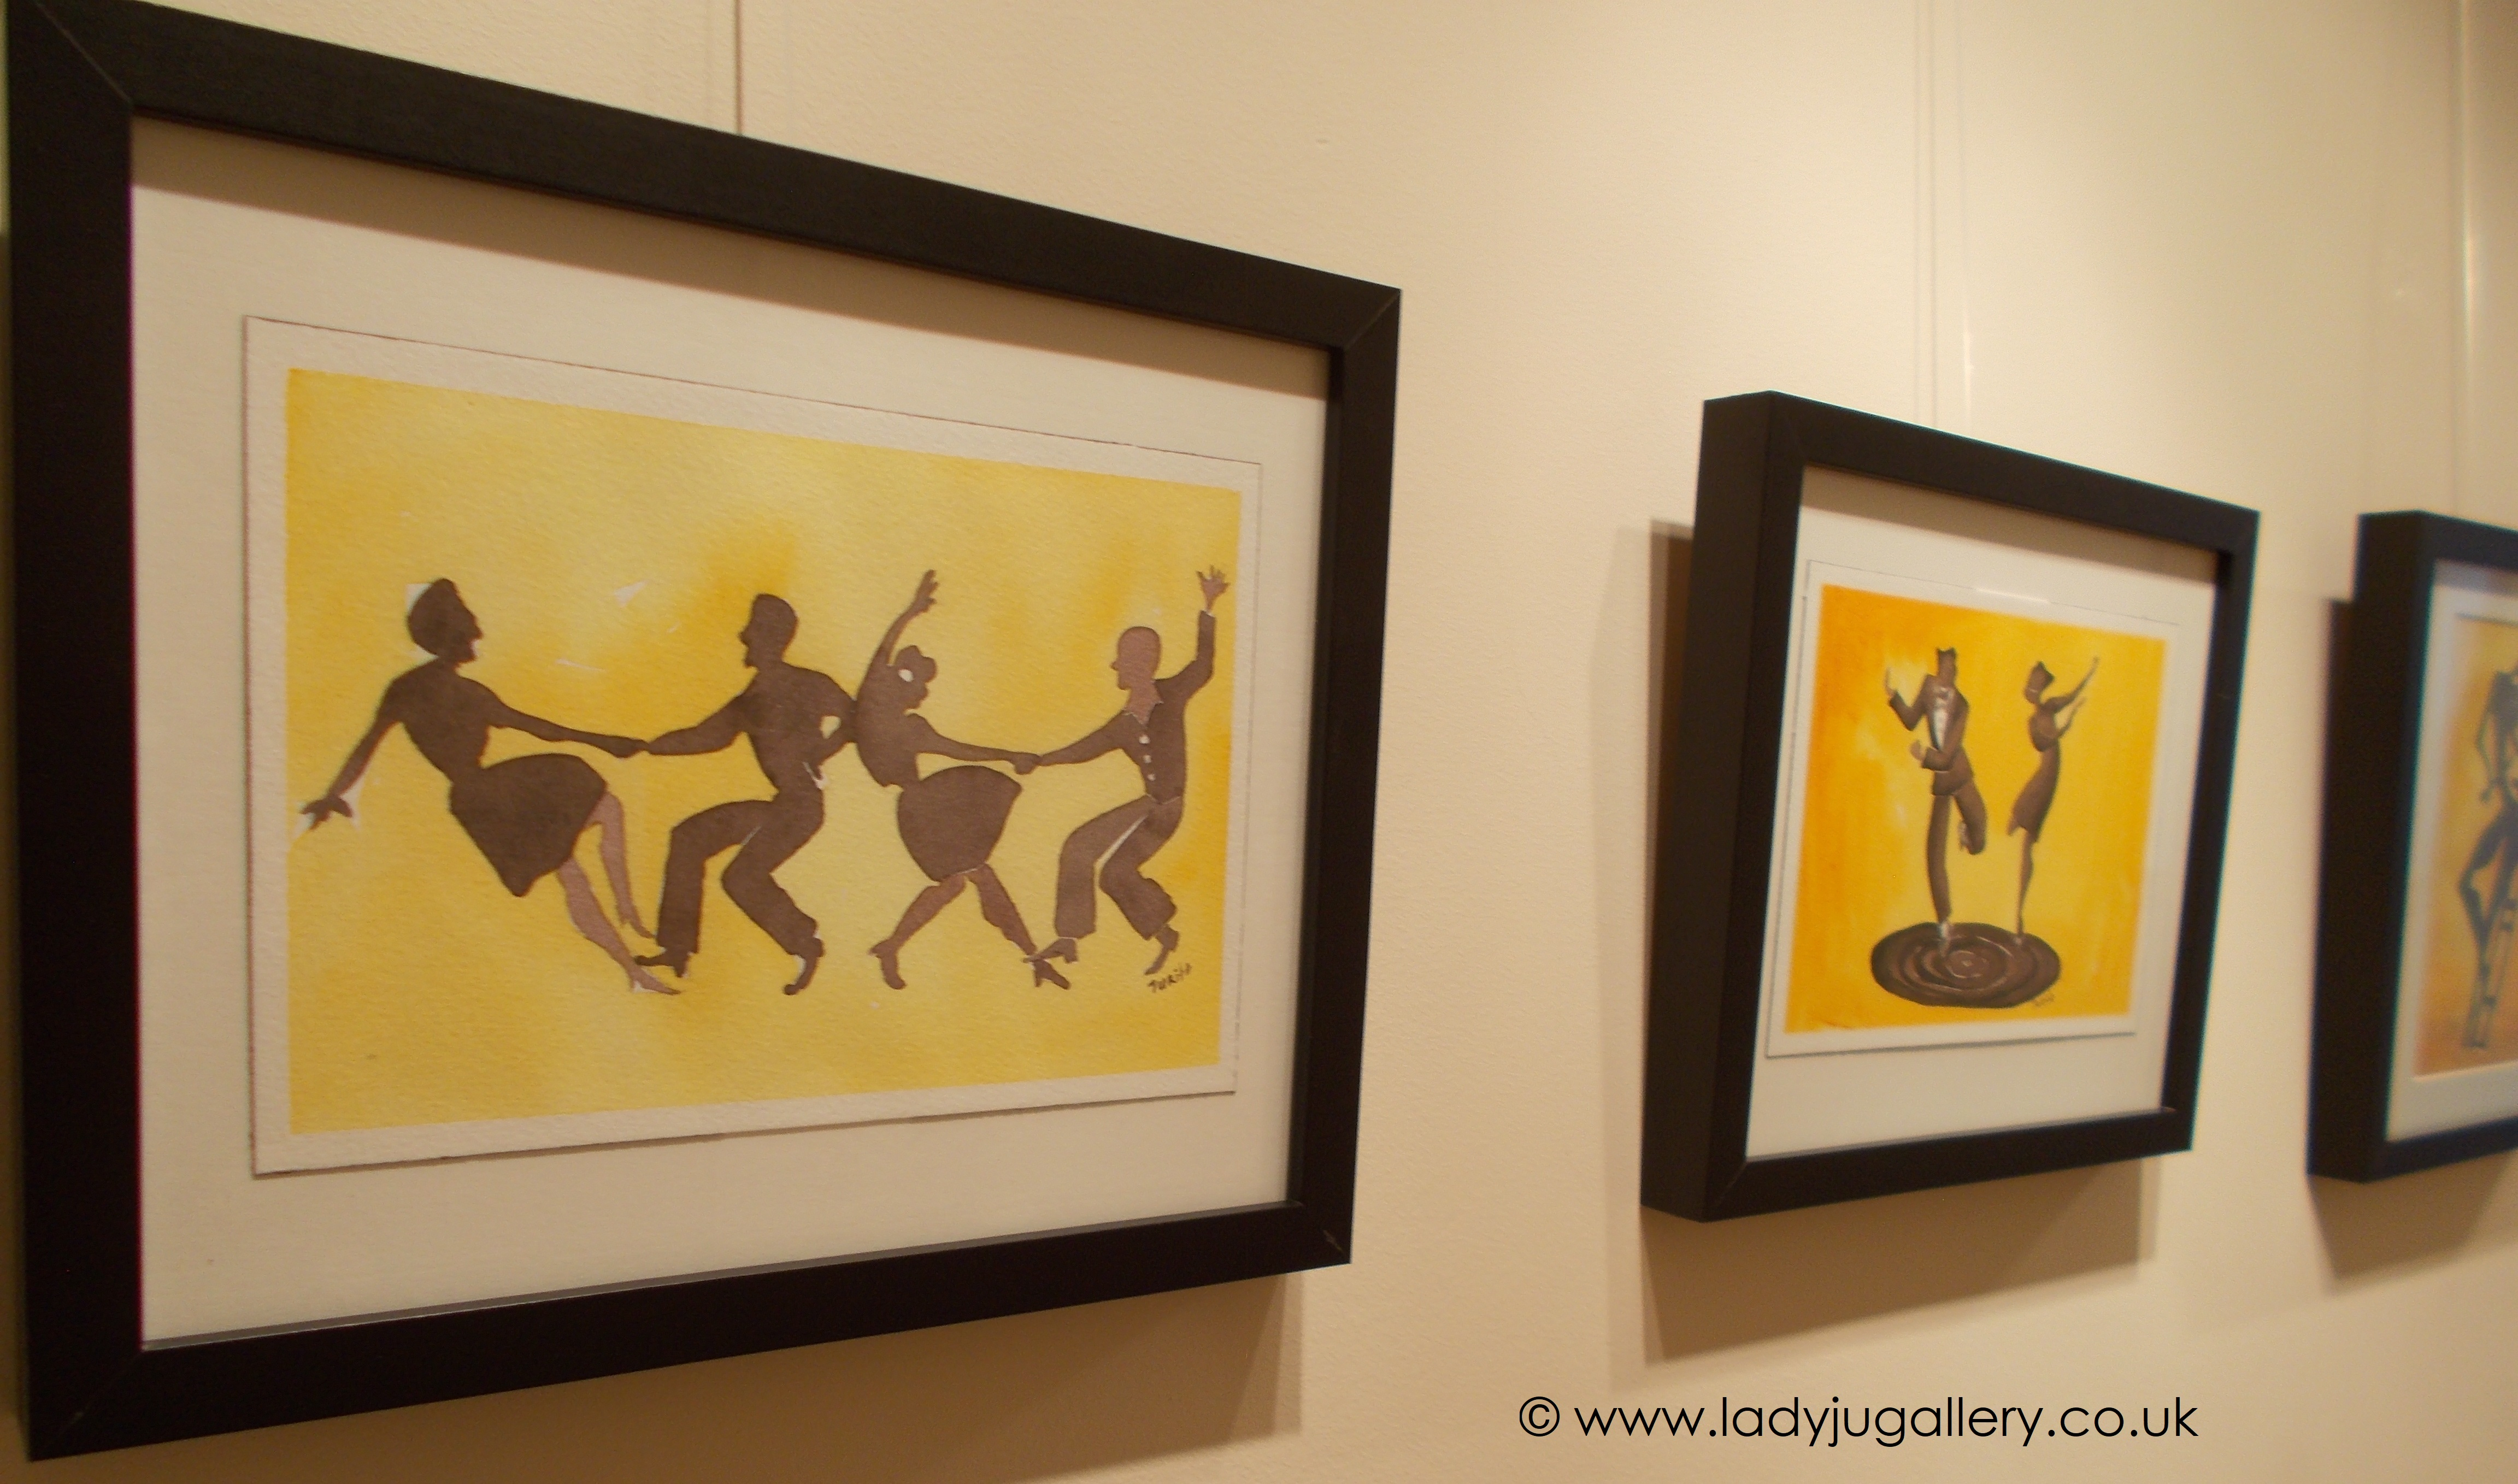 Lady_ju_gallery_new_exhibition_preparation (5)